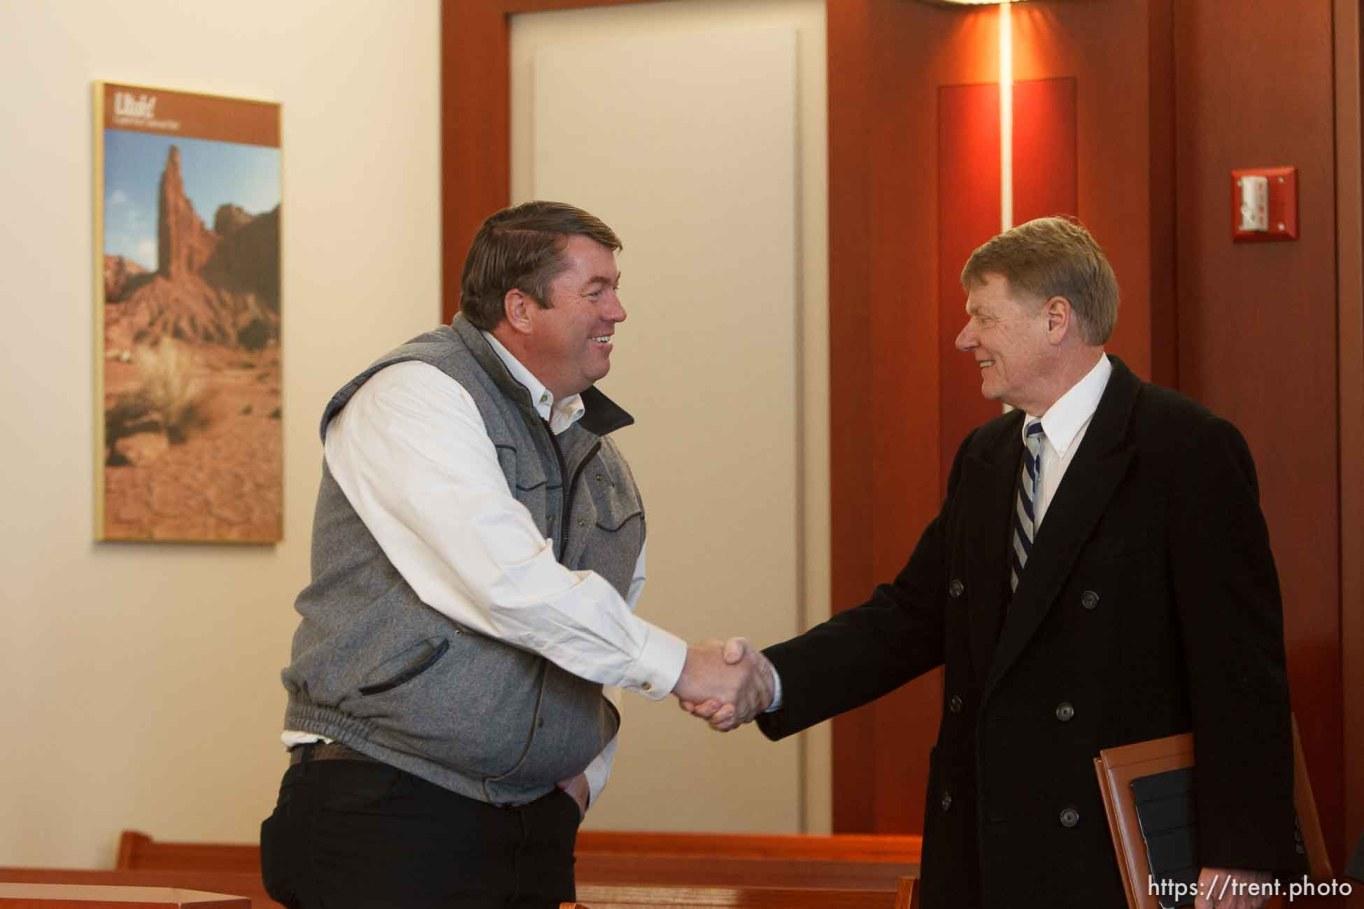 Trent Nelson | The Salt Lake Tribune Willie Jessop, Rod Parker, at a court hearing concerning Utah's management of the United Effort Plan Friday, February 15, 2013 in Salt Lake City.